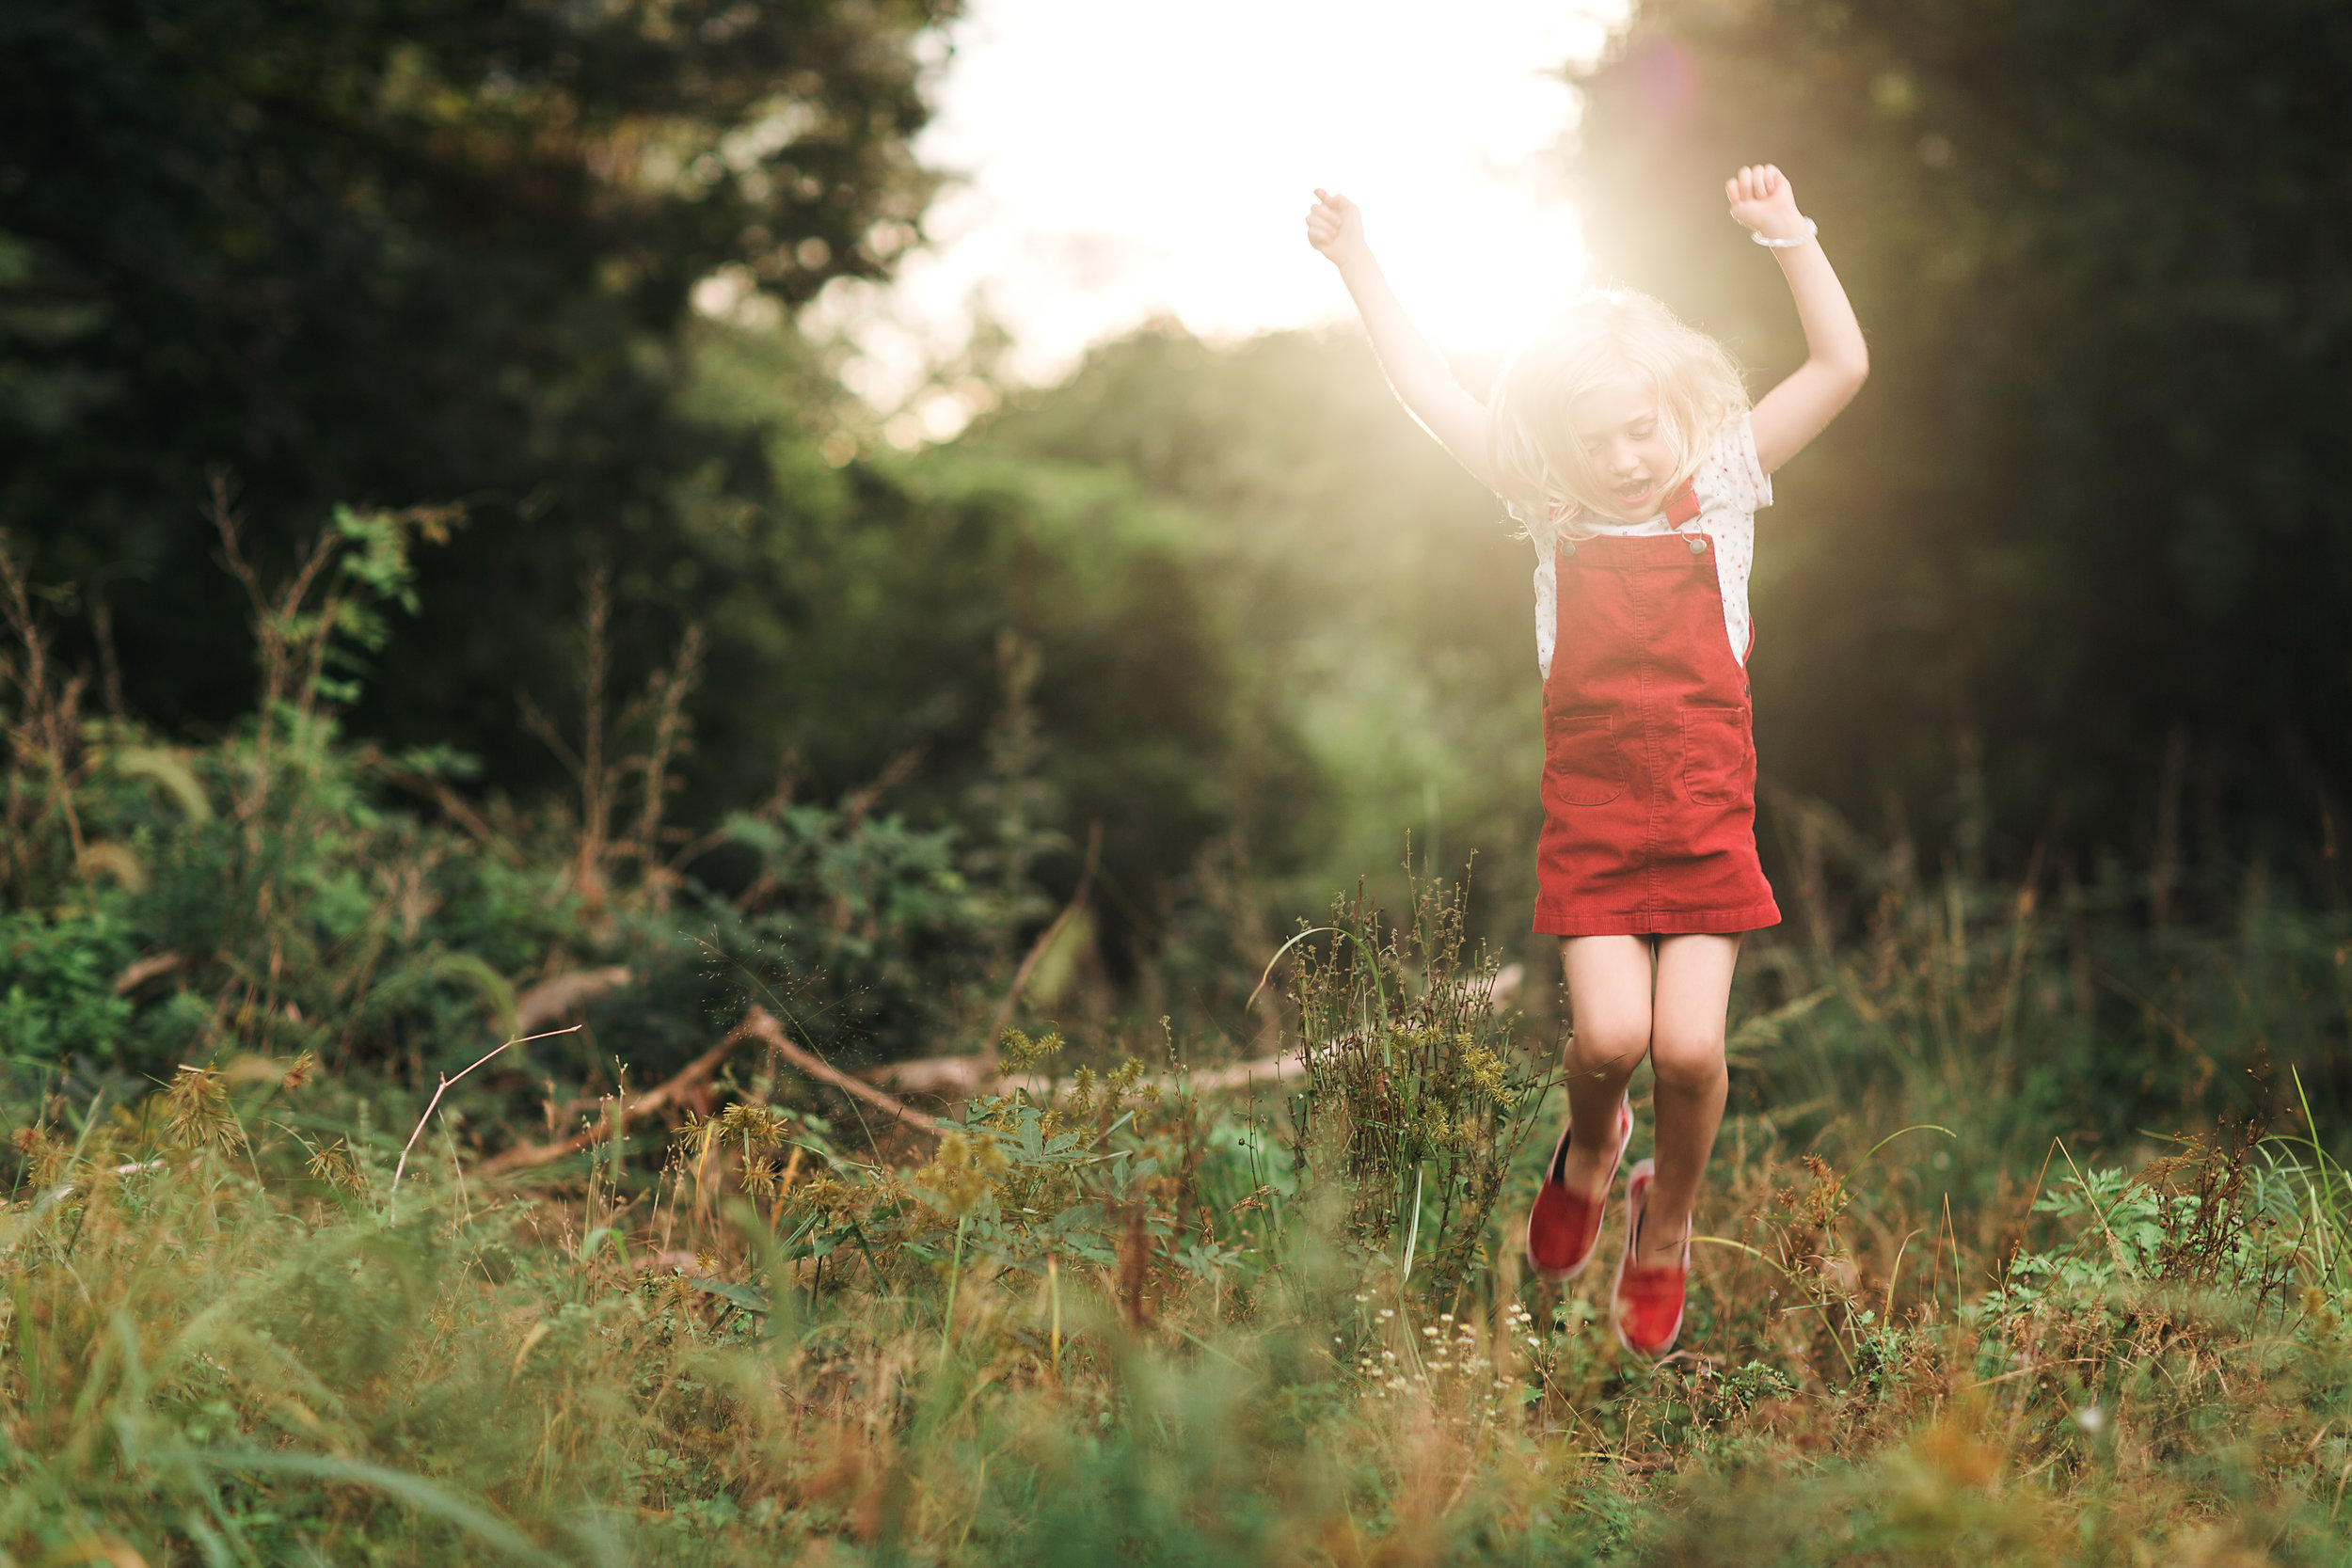 Hello-olivia-photography-long-island-family-lifestyle-photographer-ridge-red-jump.jpg